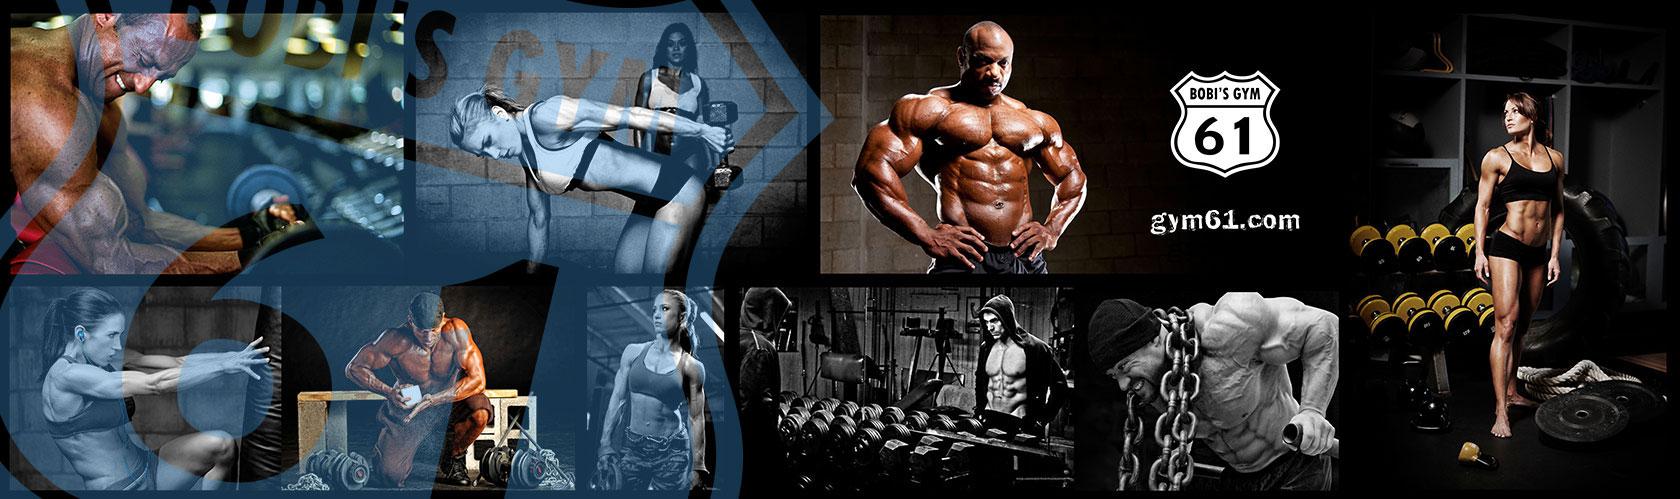 Gym 61